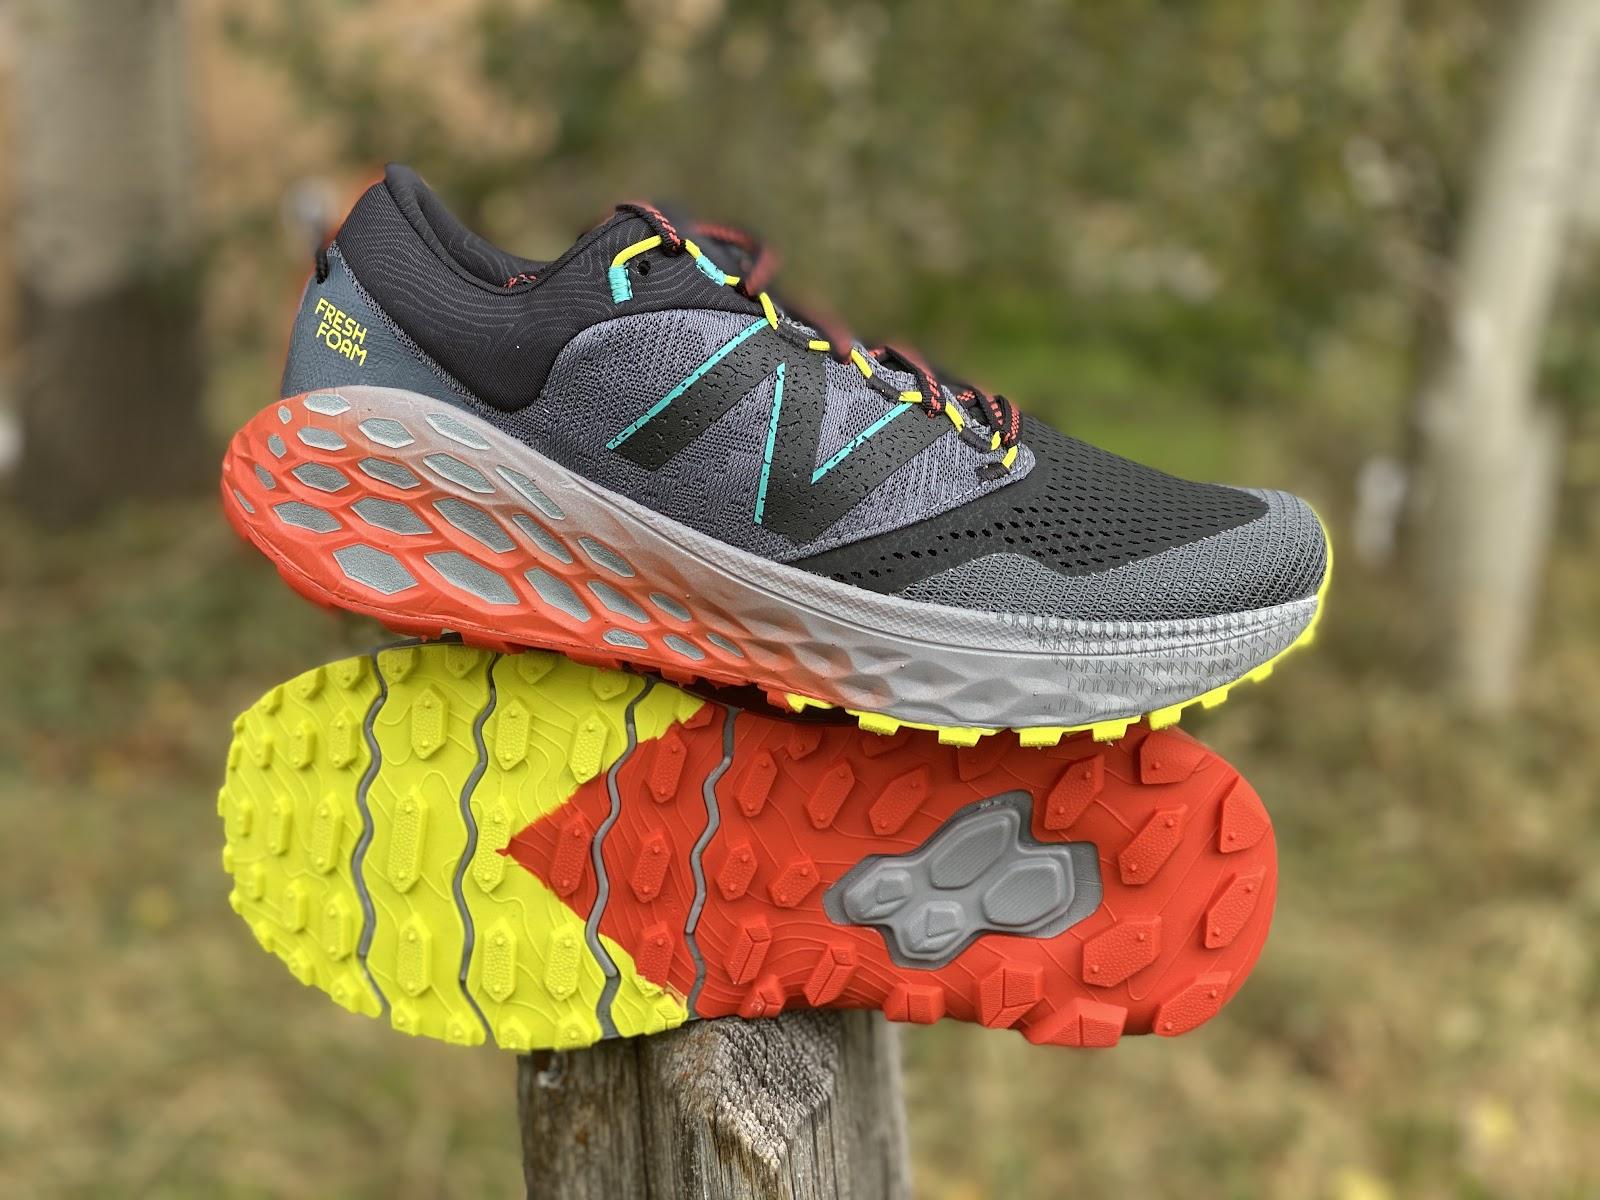 rutina Máquina de recepción fuego  Road Trail Run: New Balance Fresh Foam More Trail v1 Multi Tester Review:  Comfortable, Plush,Max Cushion Trail Cruiser